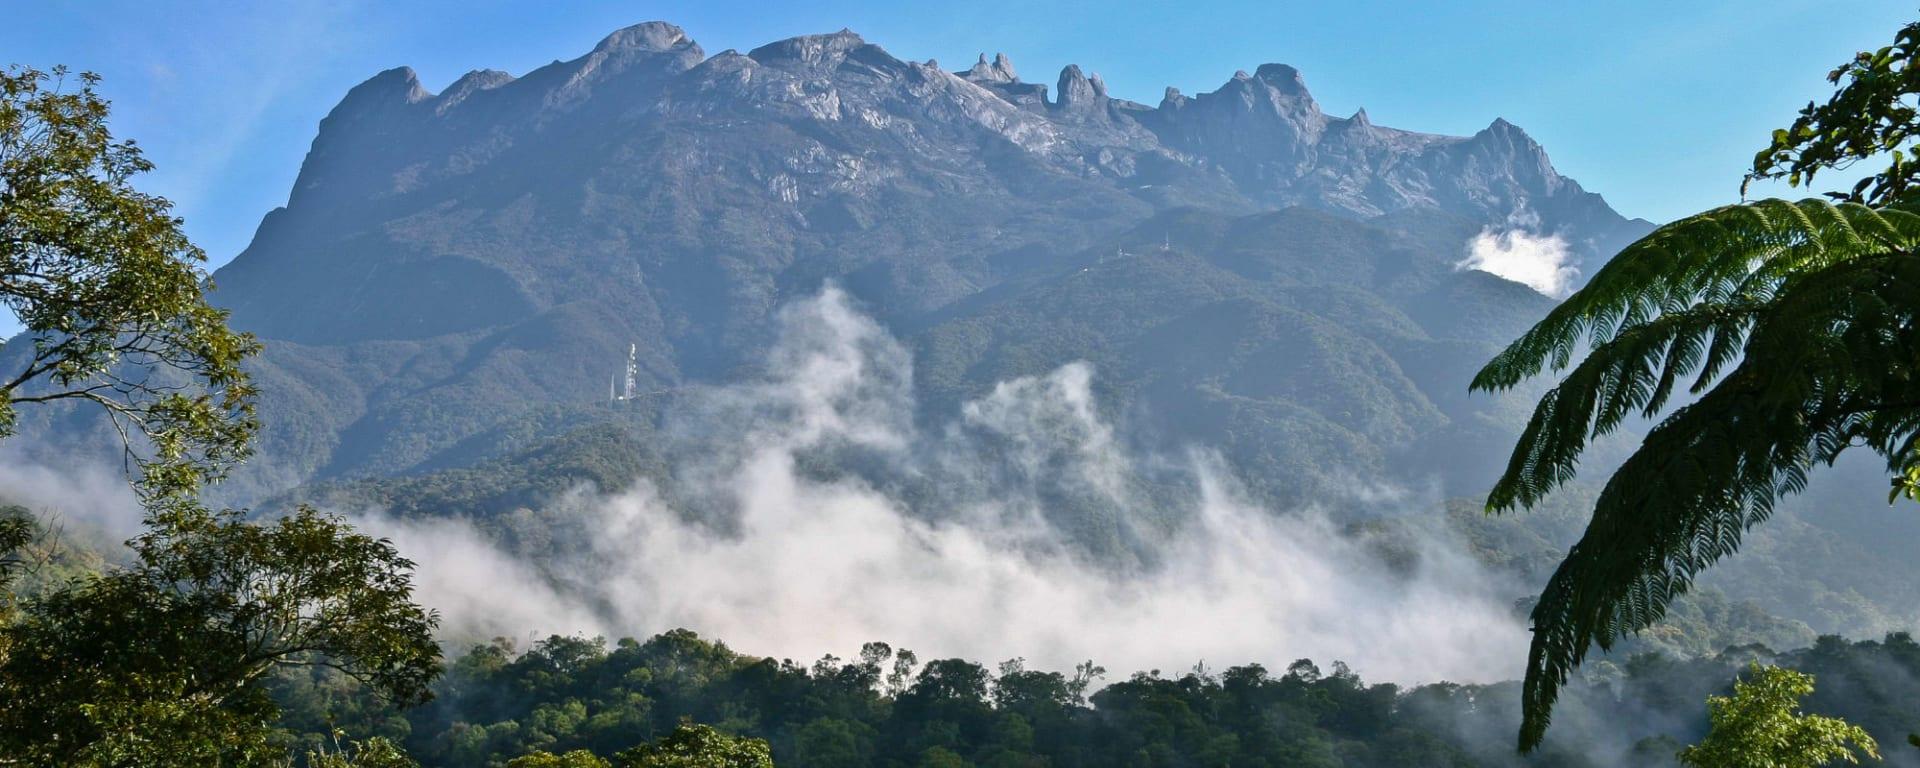 Mount Kinabalu Nationalpark, EN, Ganztägig in Kota Kinabalu: Malaysia Borneo Mount Kinabalu